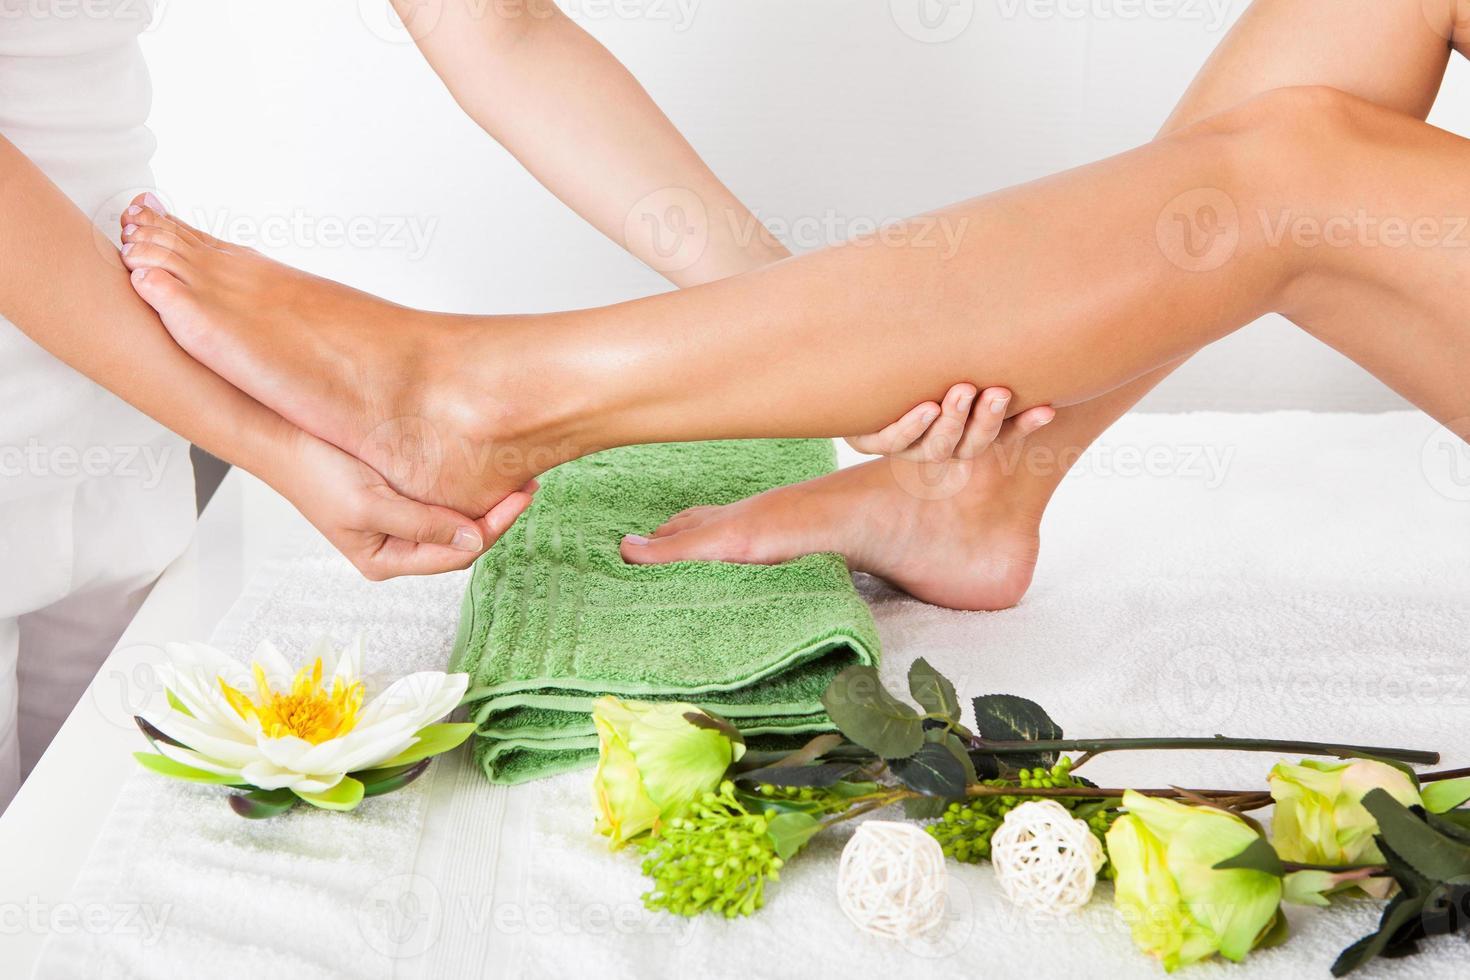 mujer pies sometidos a masaje foto